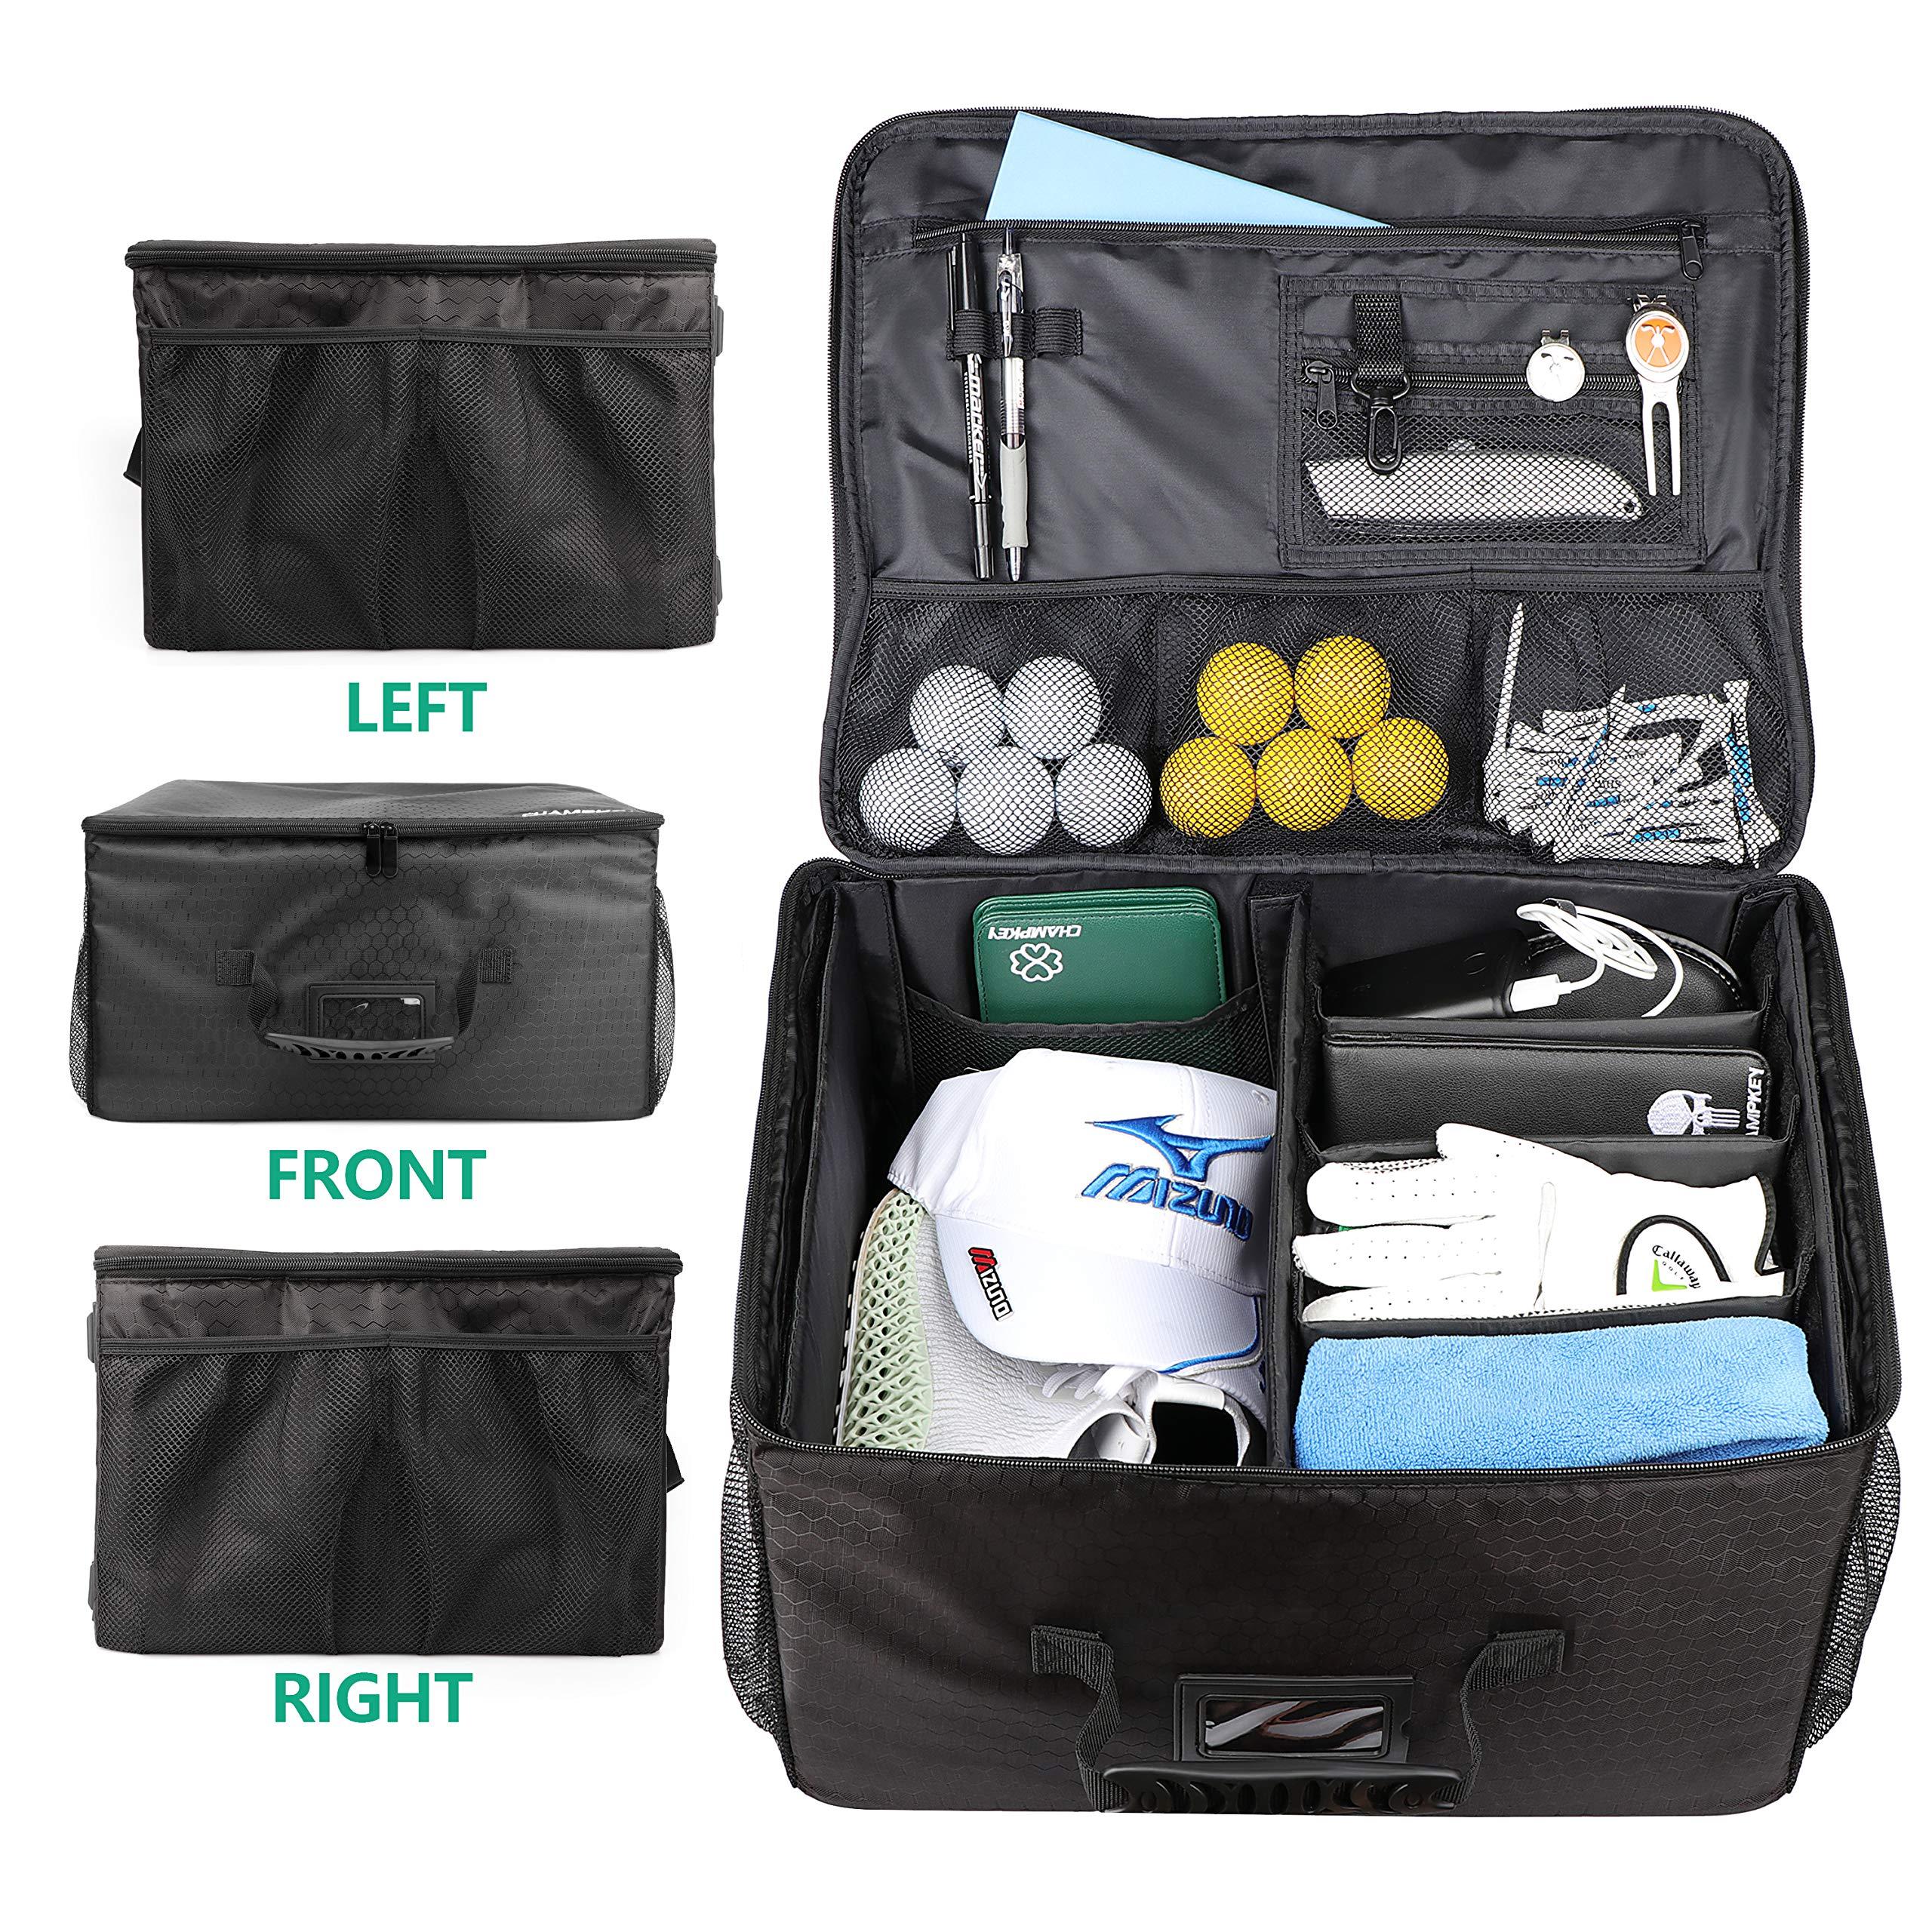 Champkey Golf Trunk Organizer Storage-Portable and Foldable Golf Travel Storage Locker Ideal for Travel Golf and Car Golf (Black) by Champkey